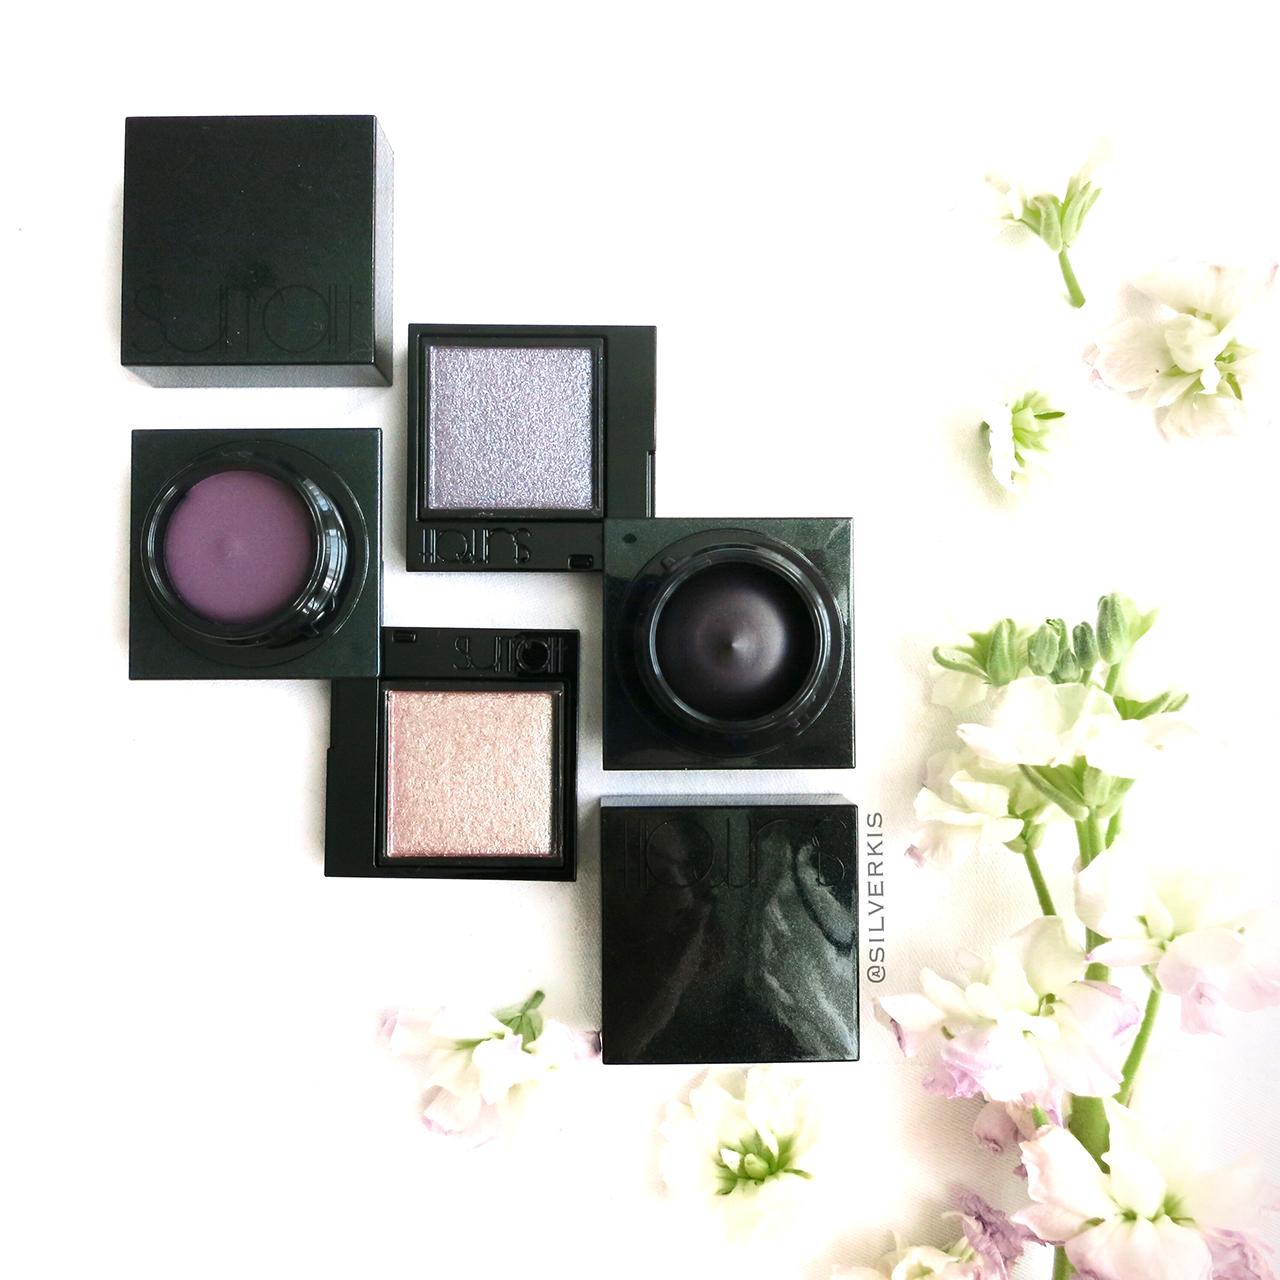 Surent Prismatique Eyes - Visual & Glamour Eyes